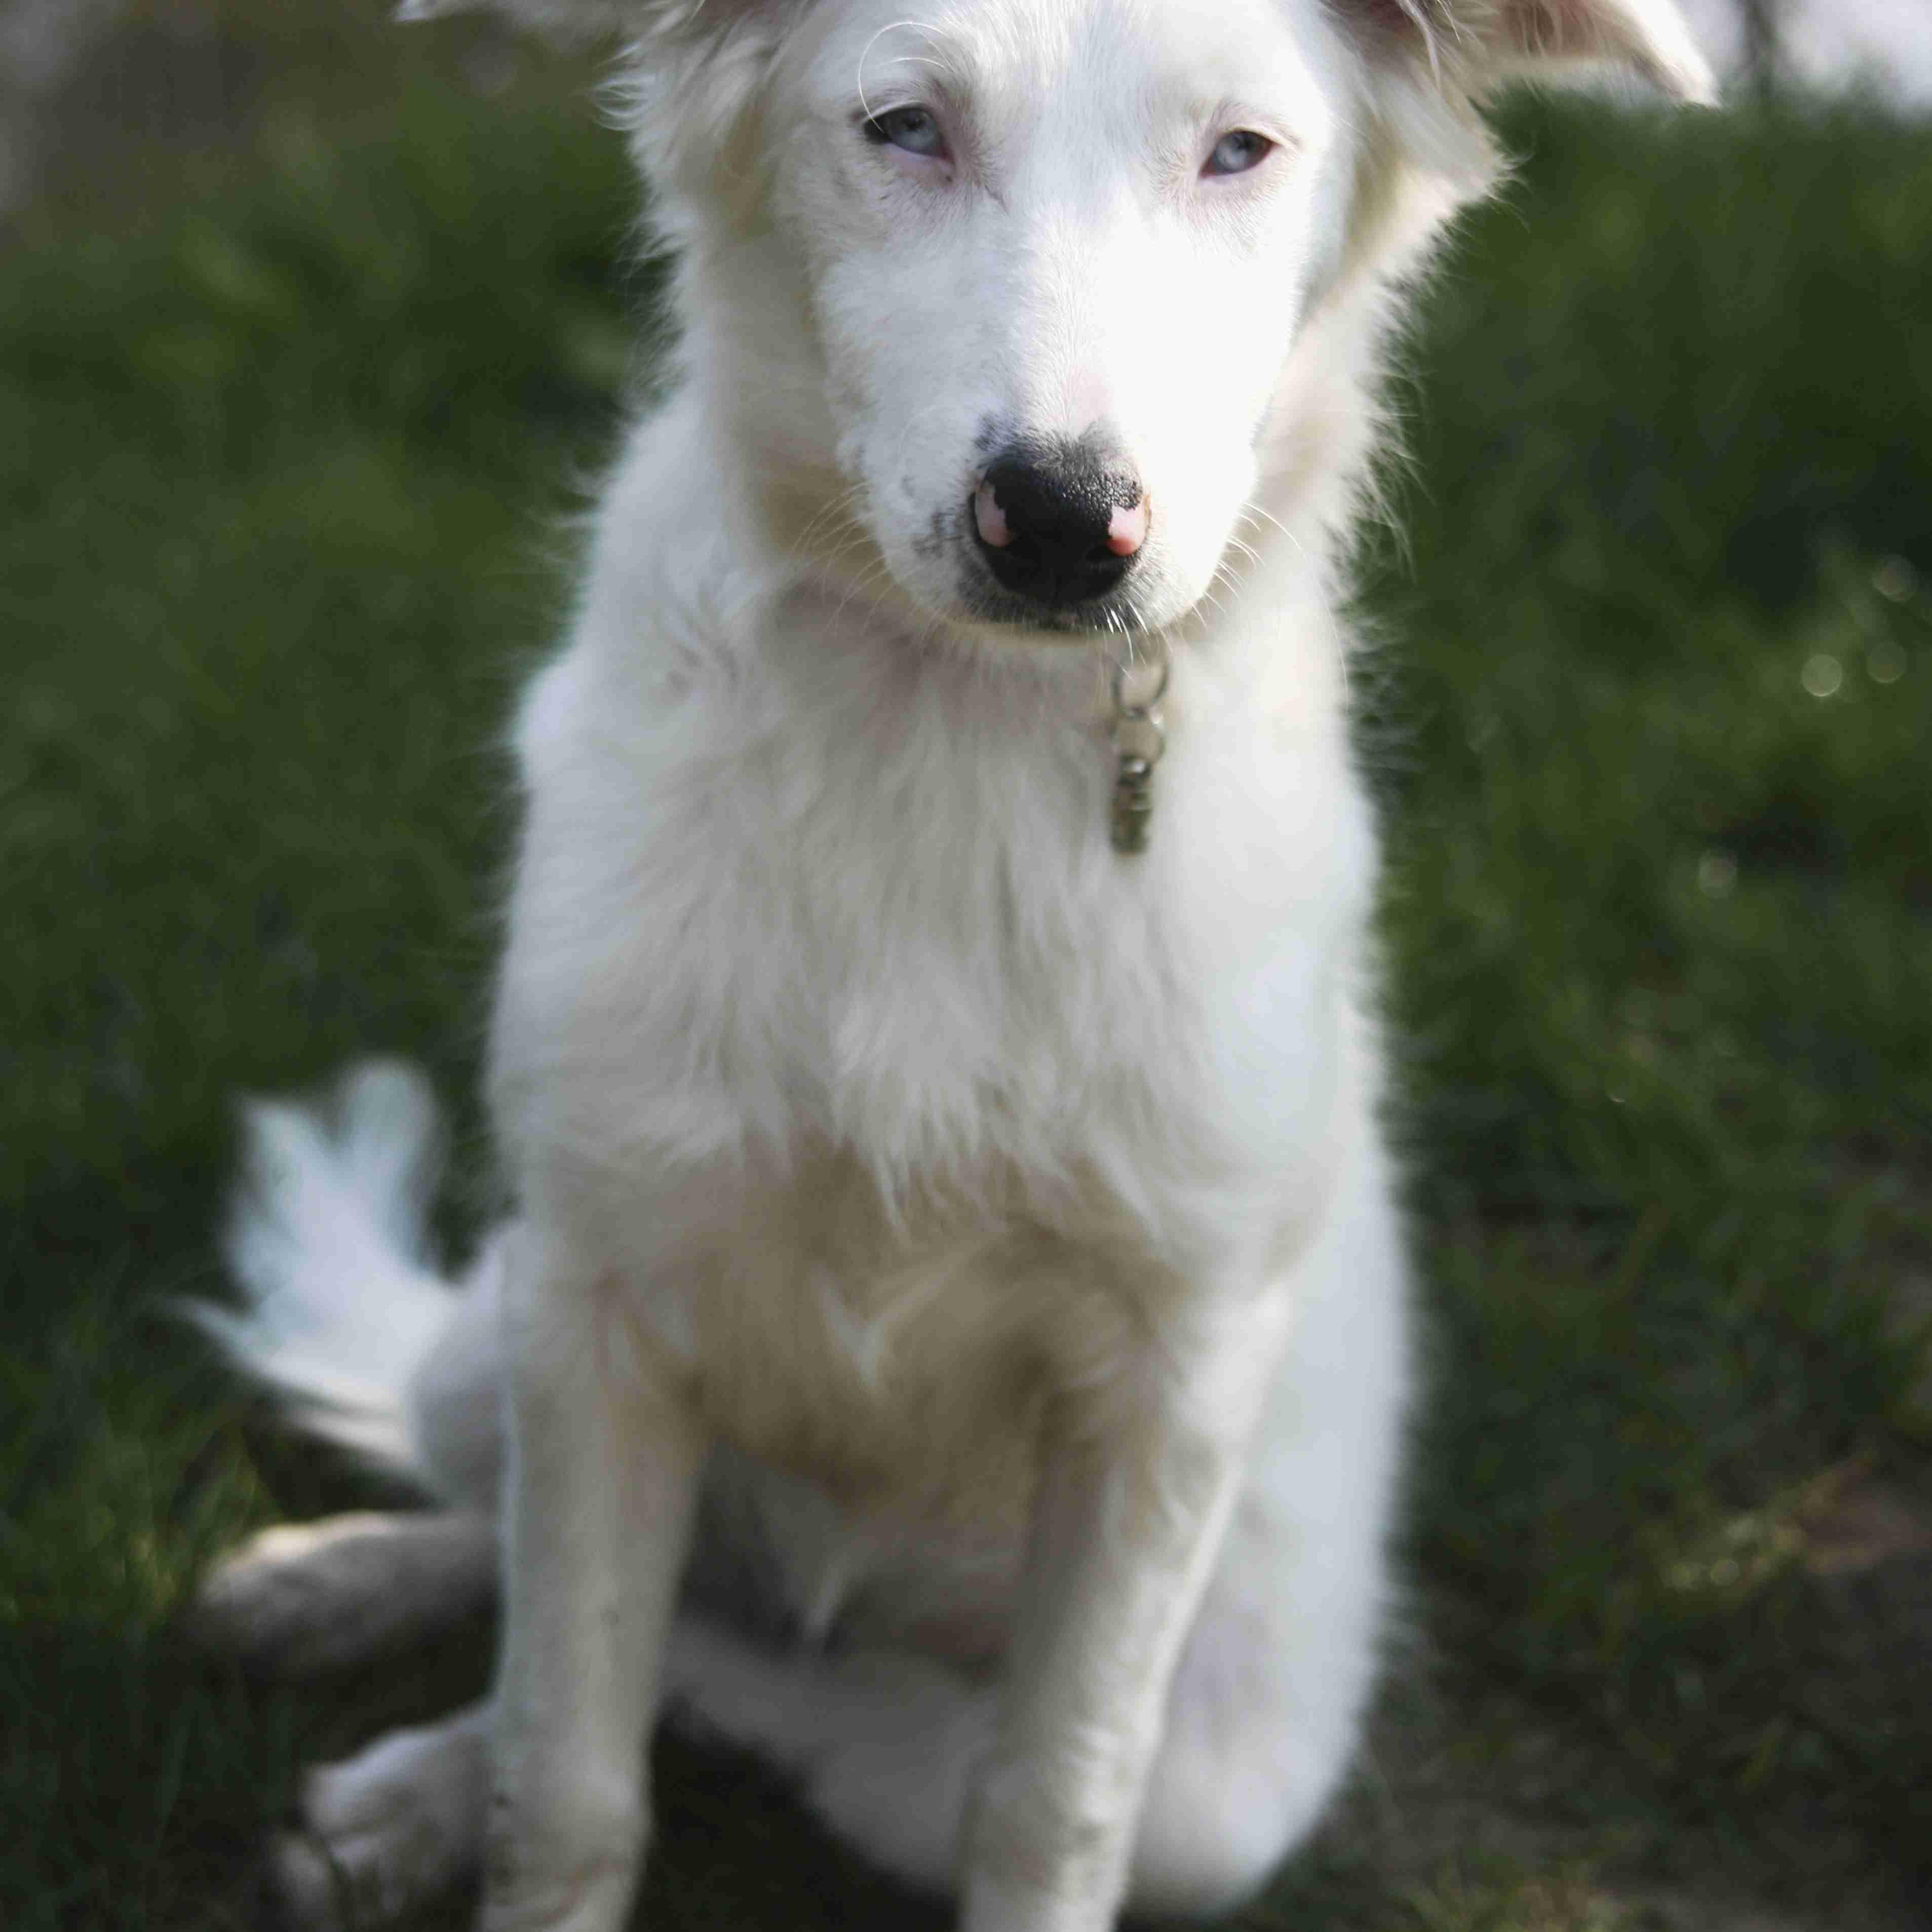 Deaf collie puppy posing